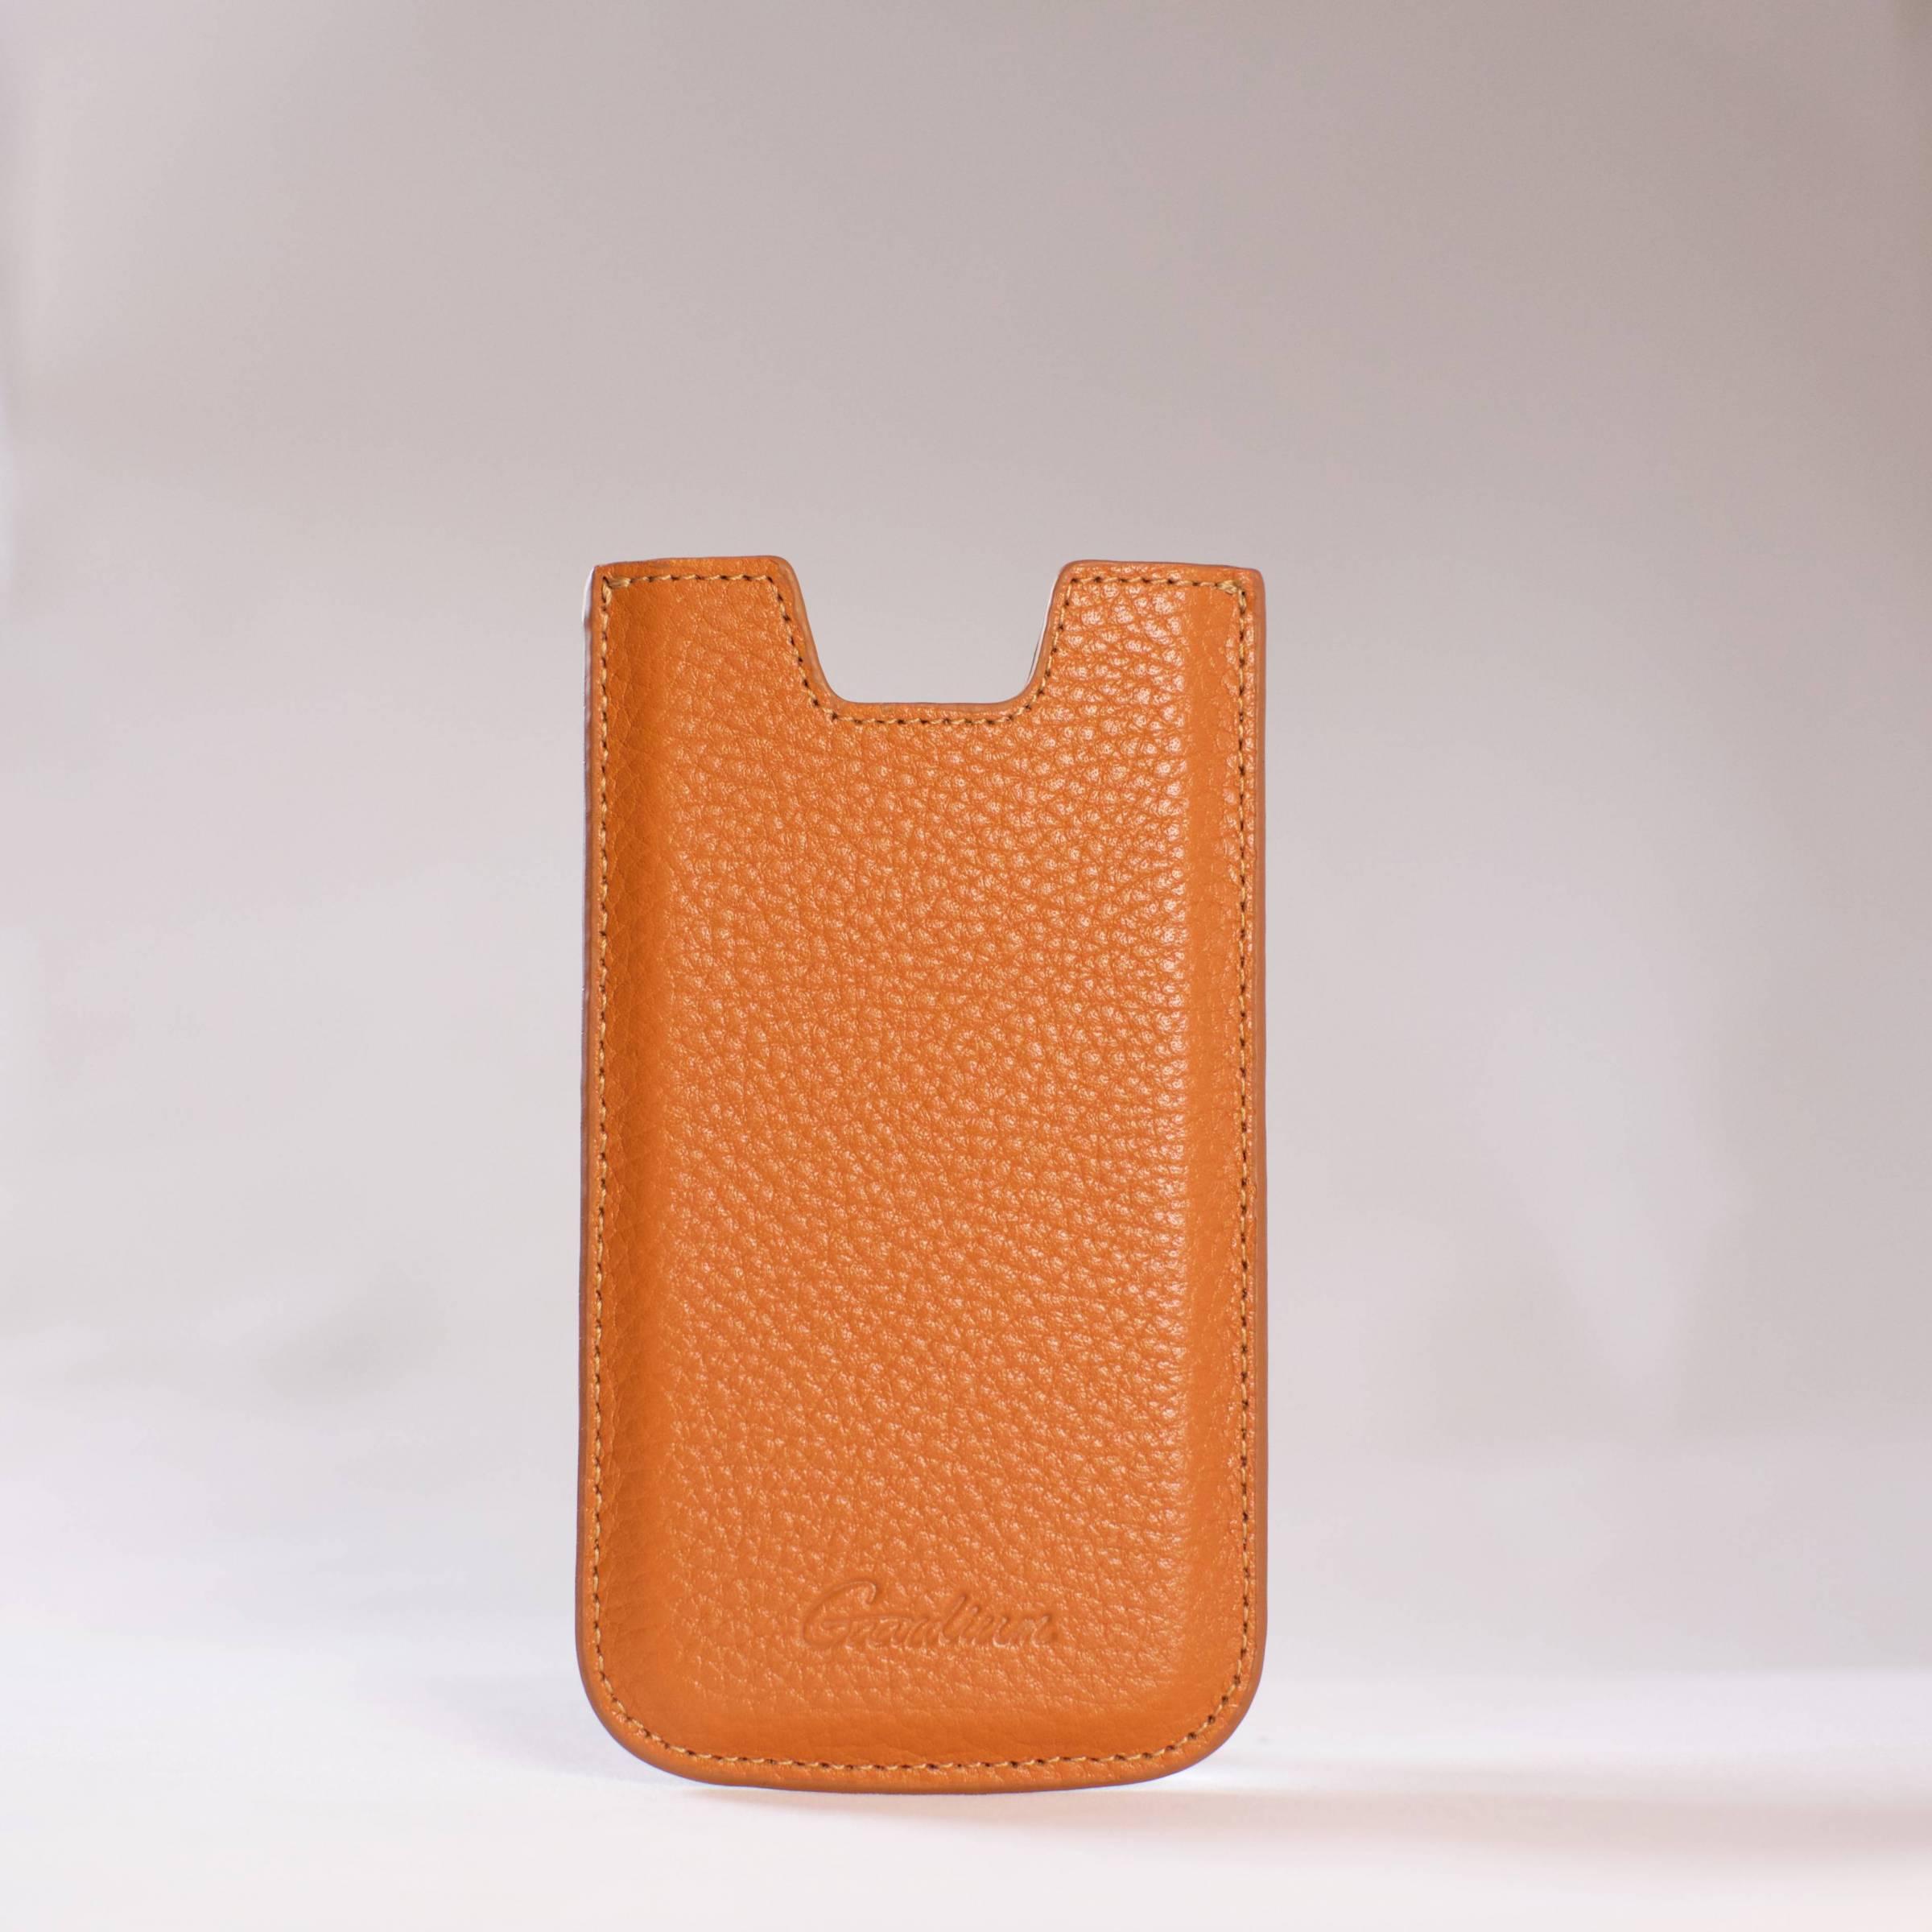 gaardium Gaardium sleeve iphone 5/5s/5c/se farve brun fra mackabler.dk